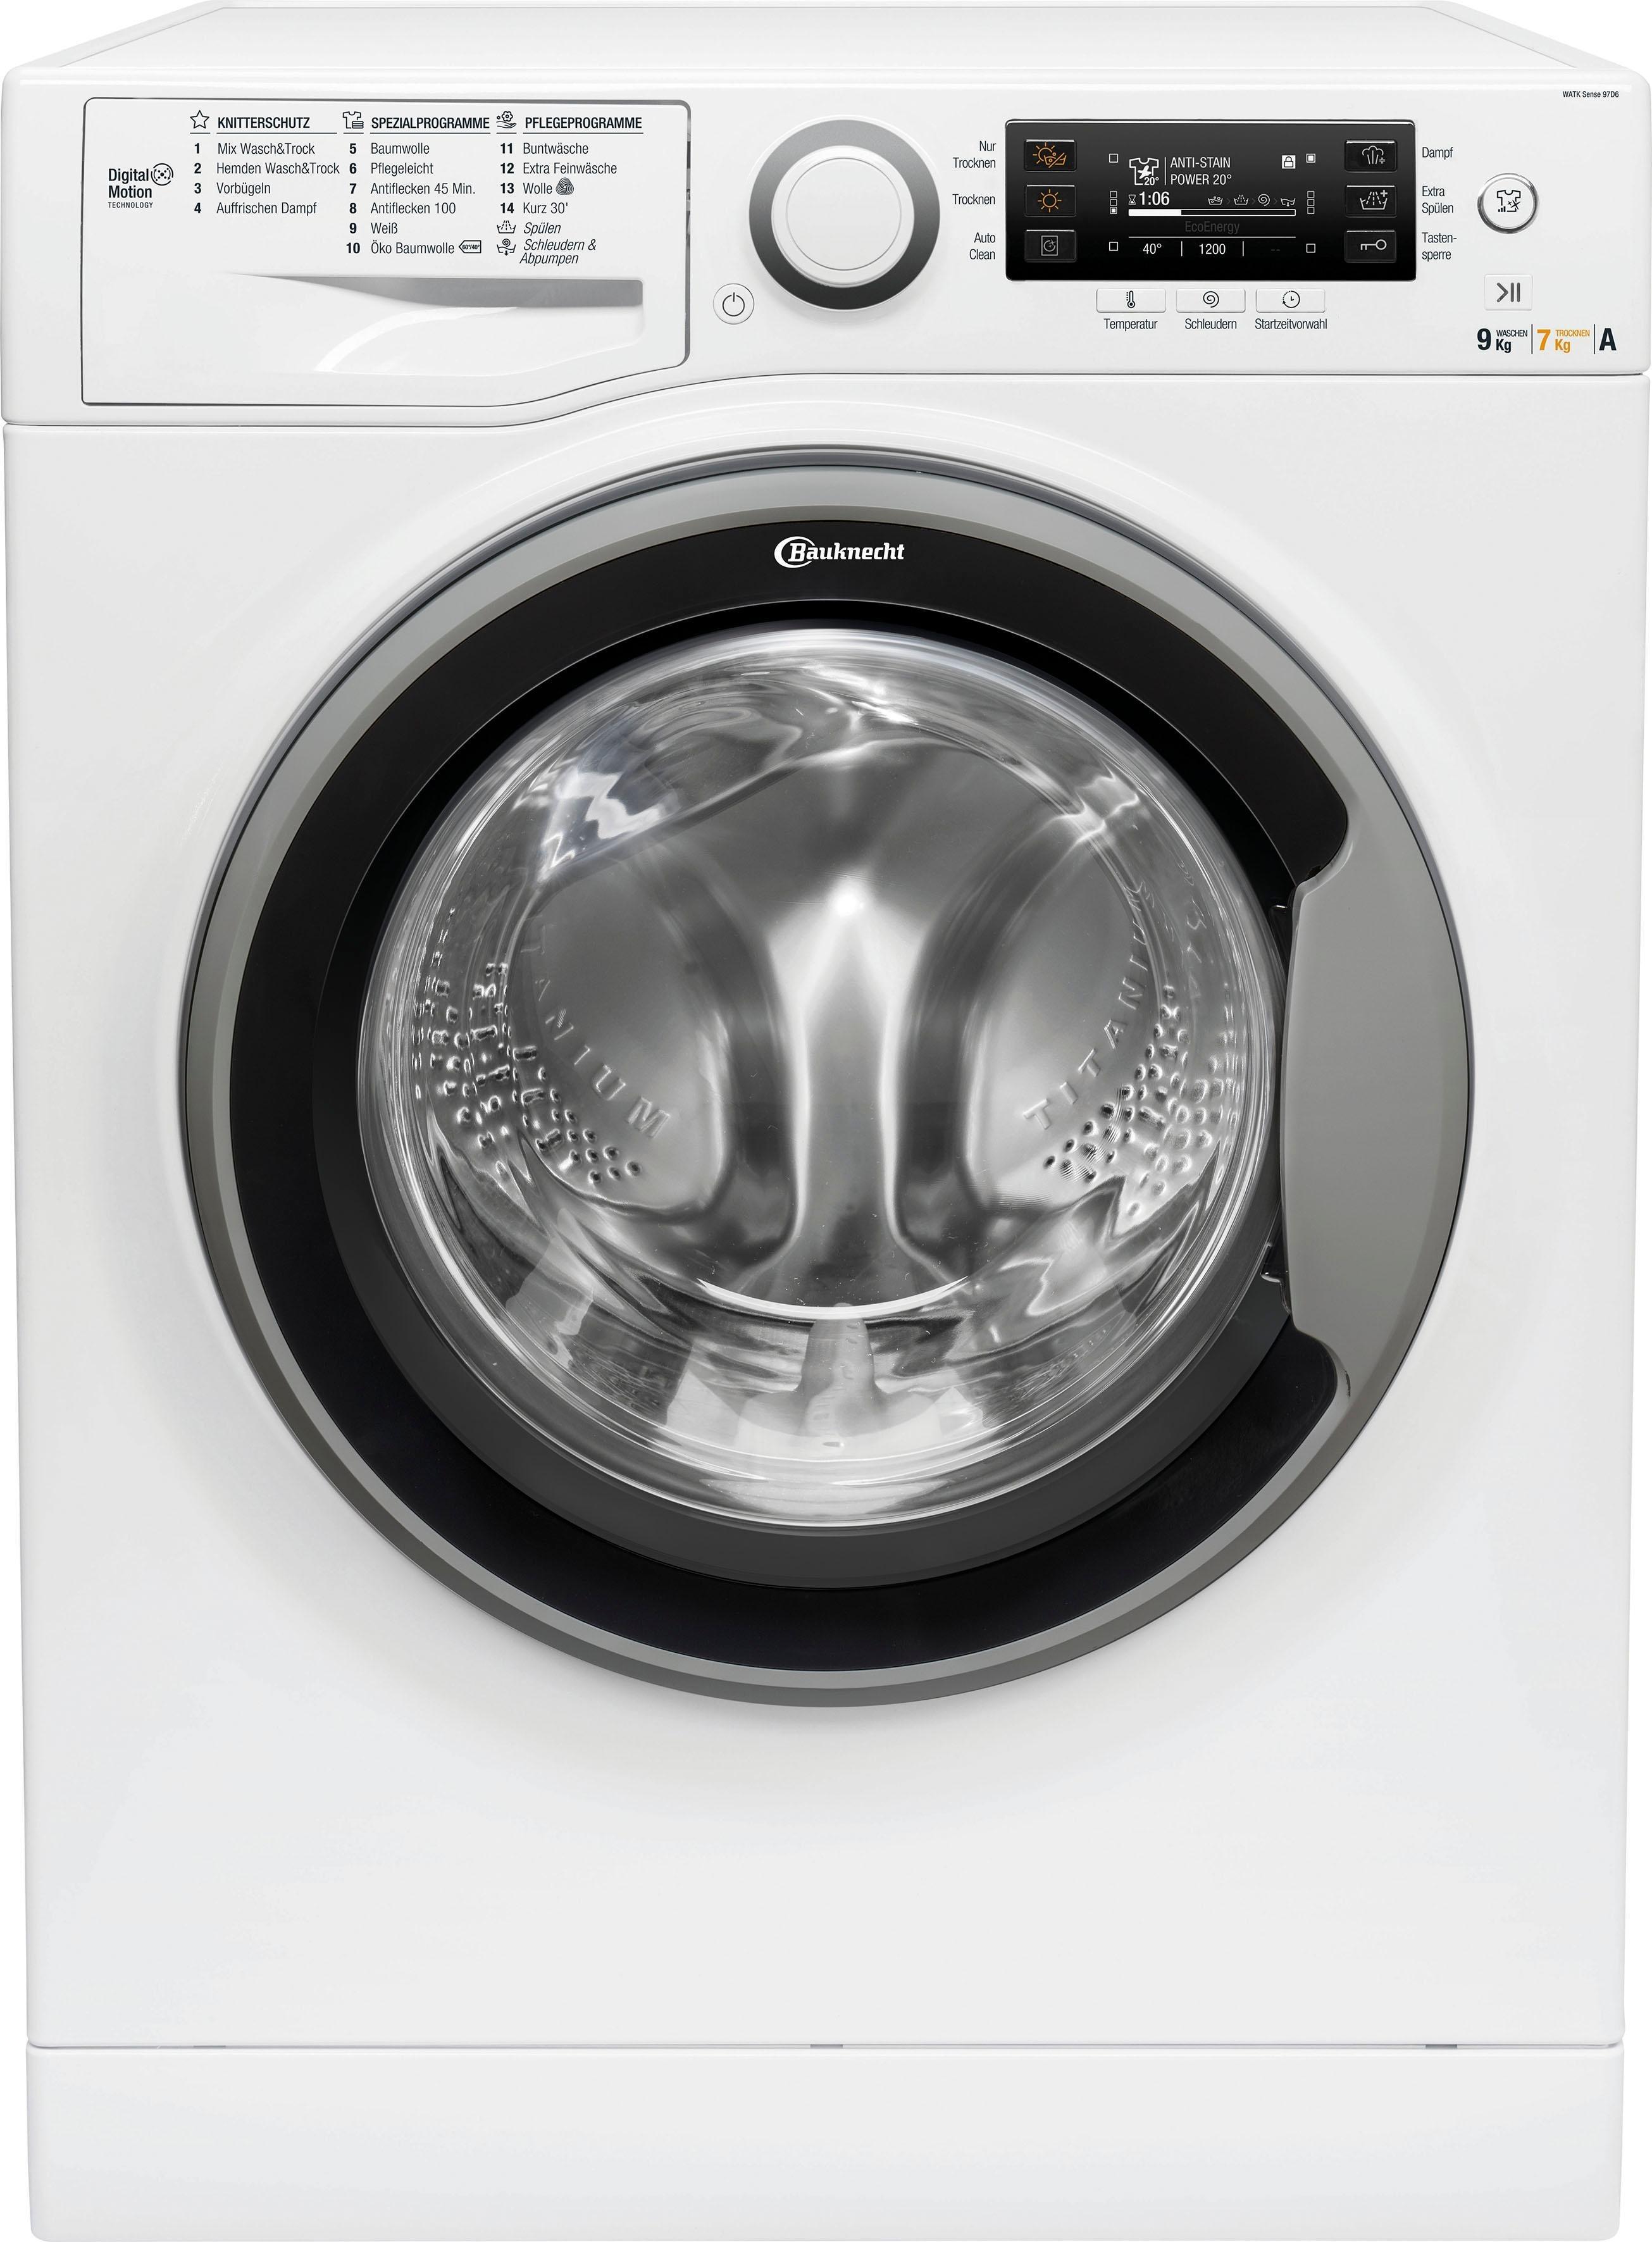 BAUKNECHT Waschtrockner, 9 kg/7 kg, 1600 U/Min